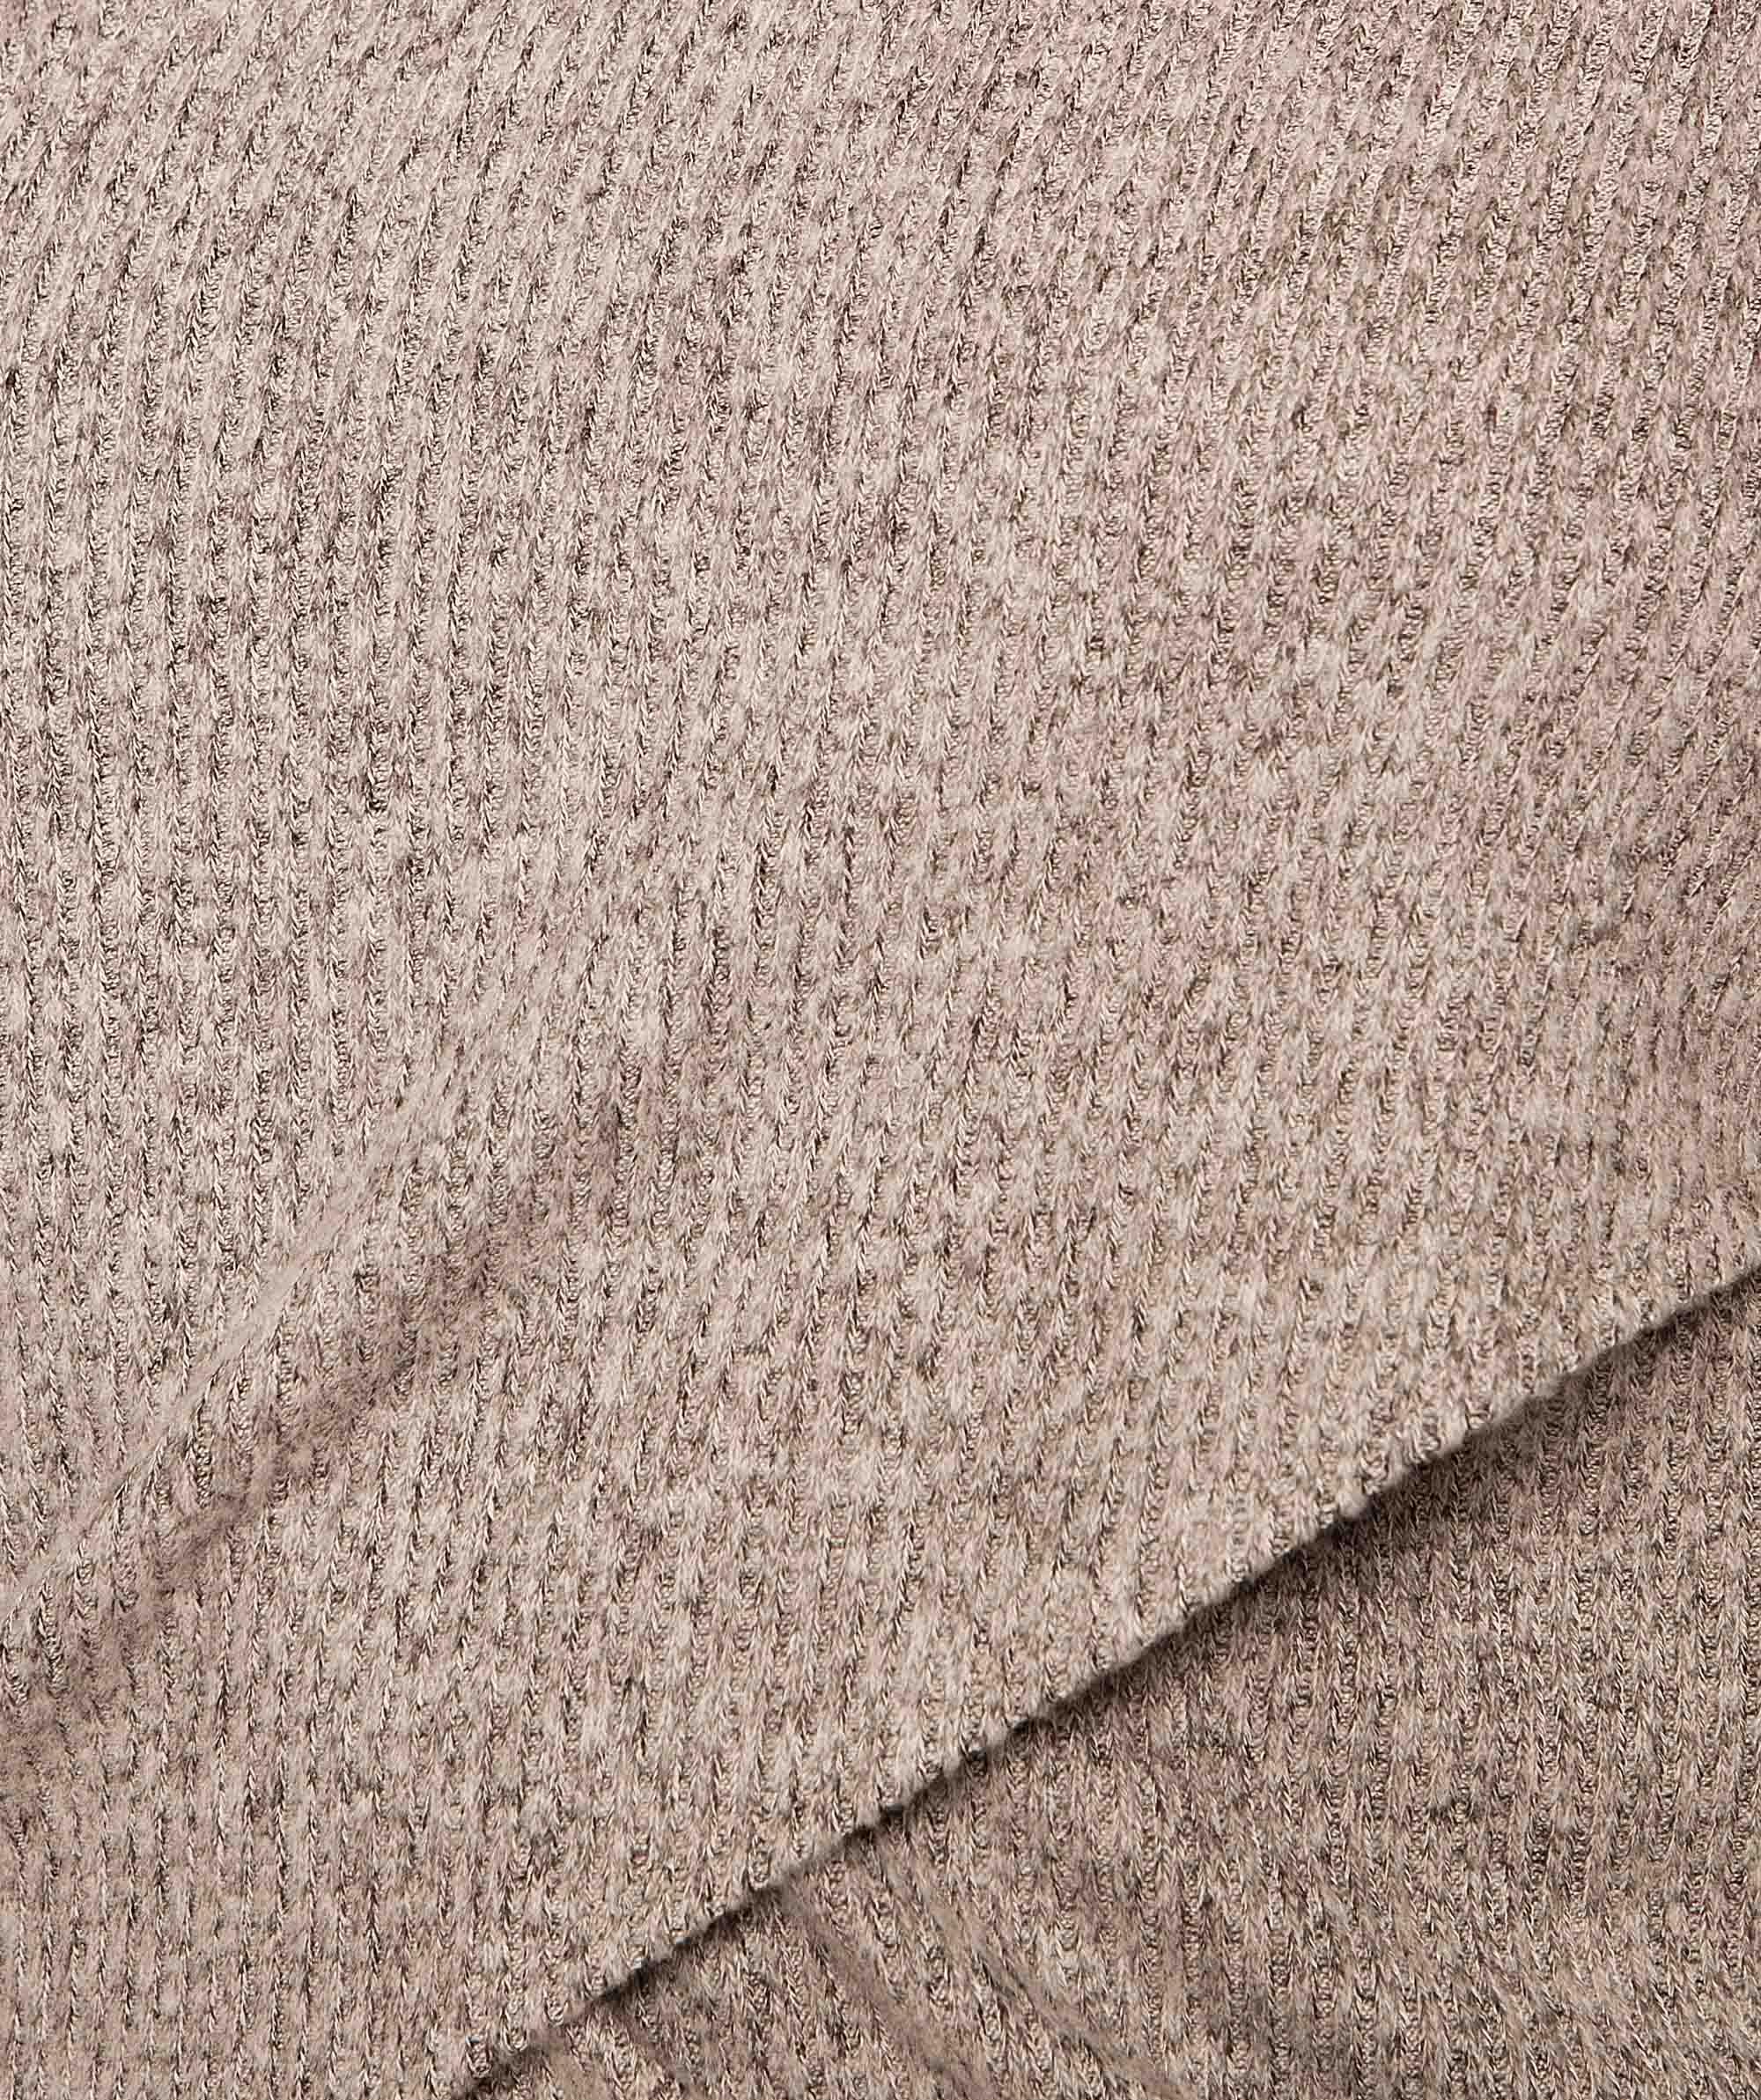 Barre Cross Front Long Sleeve Top - Grey